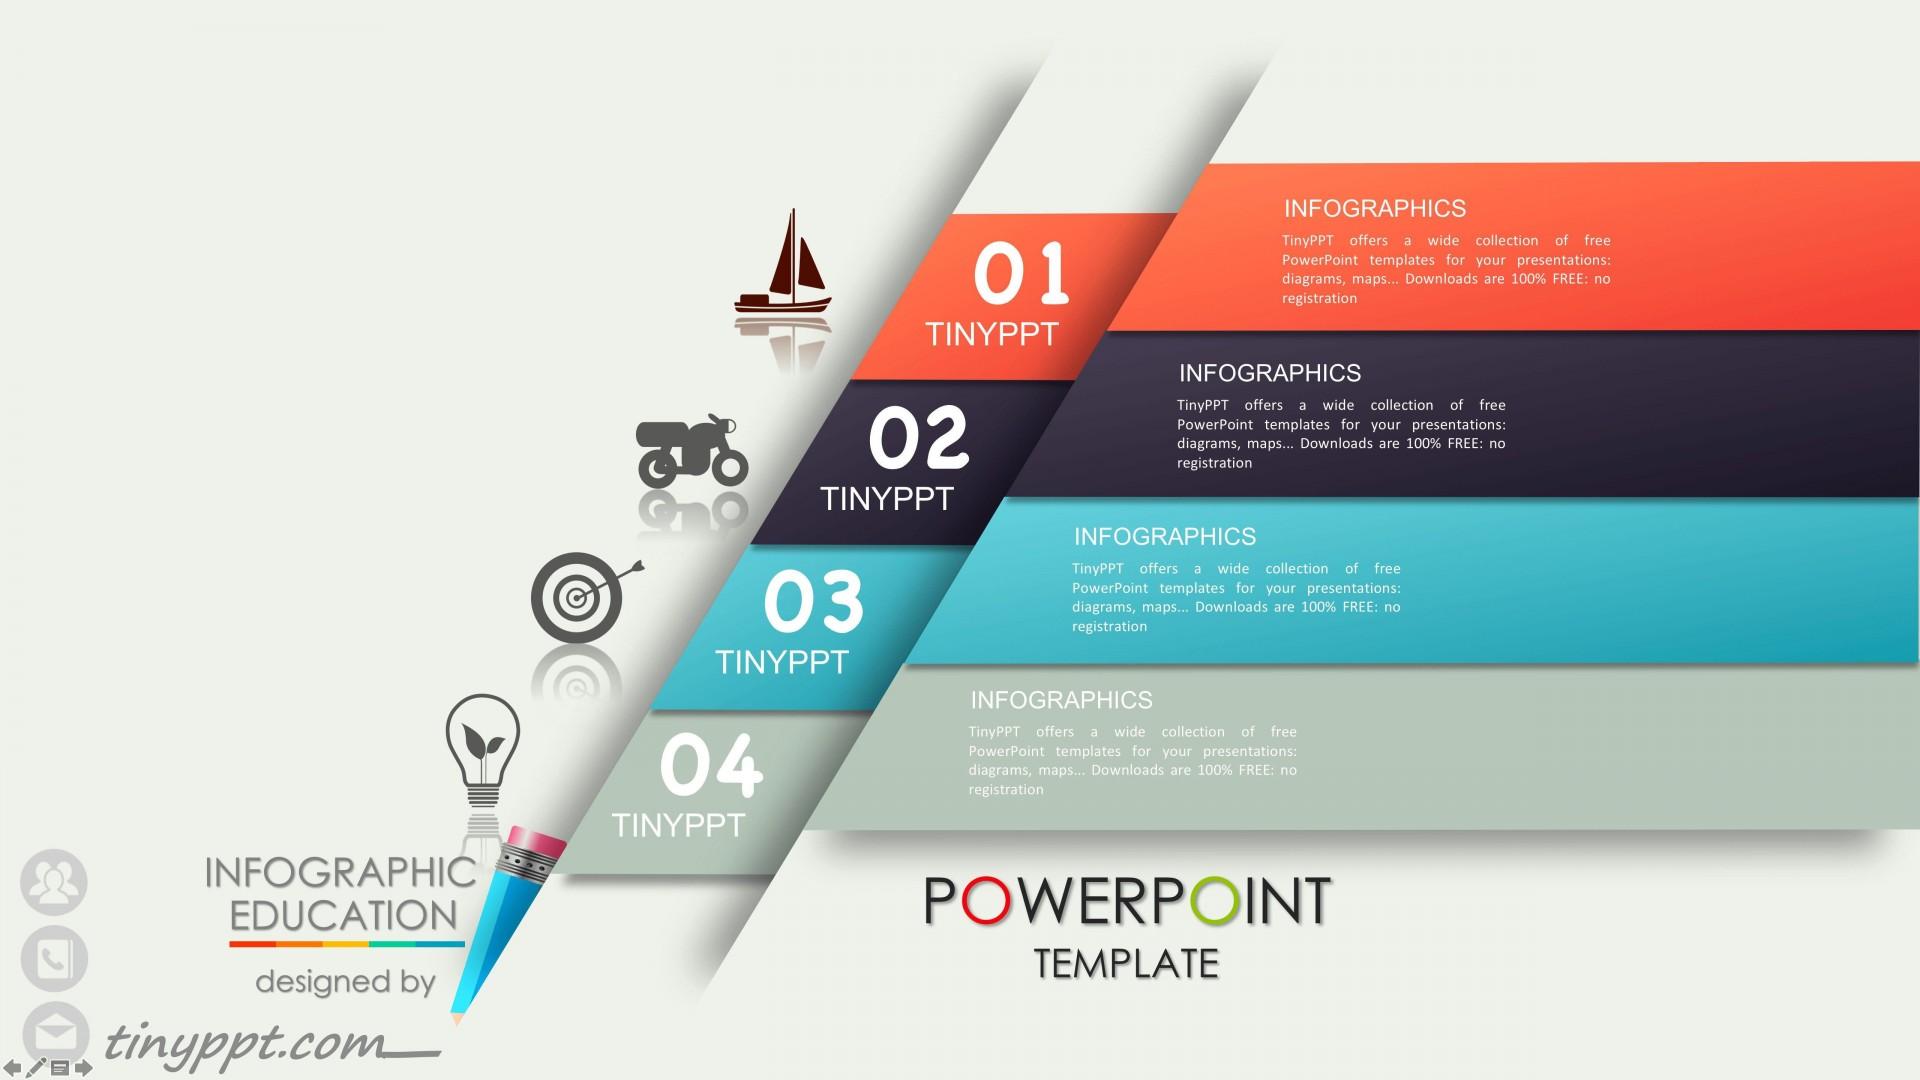 001 Wonderful Free Busines Plan Powerpoint Template Download Photo  Modern Ultimate1920